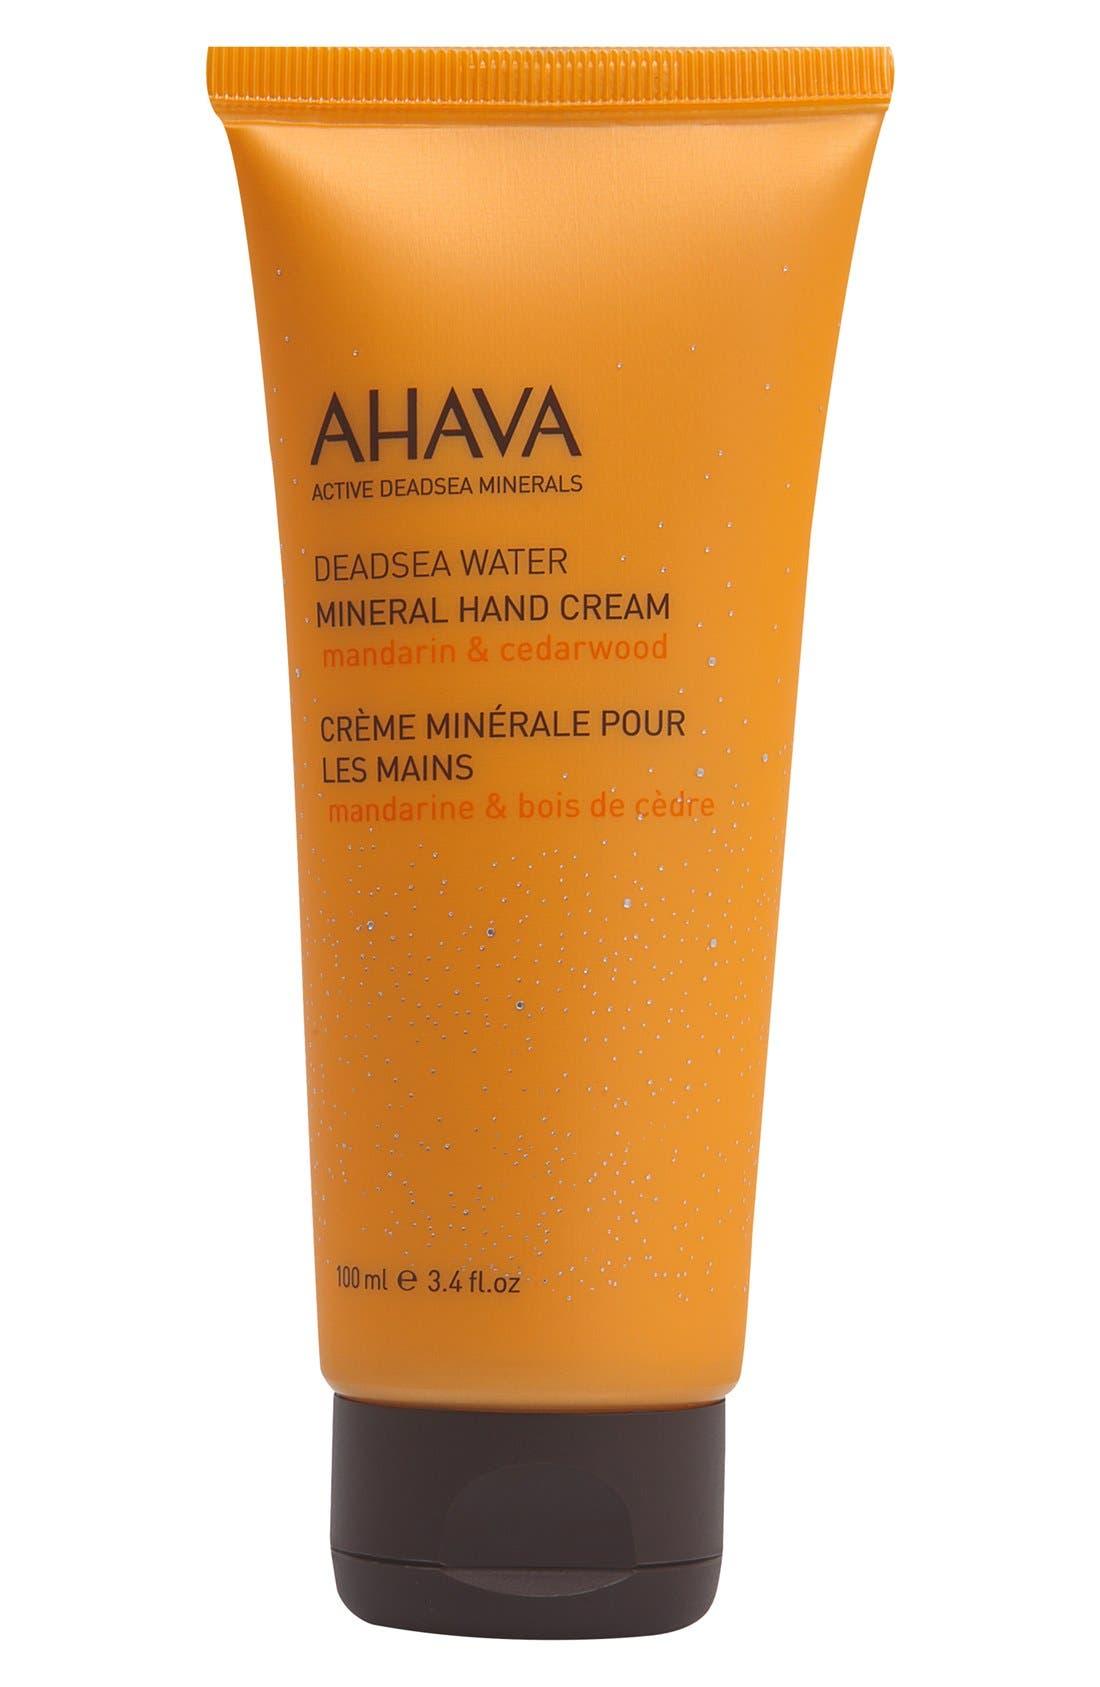 AHAVA Mineral Hand Cream (3.4 oz.)